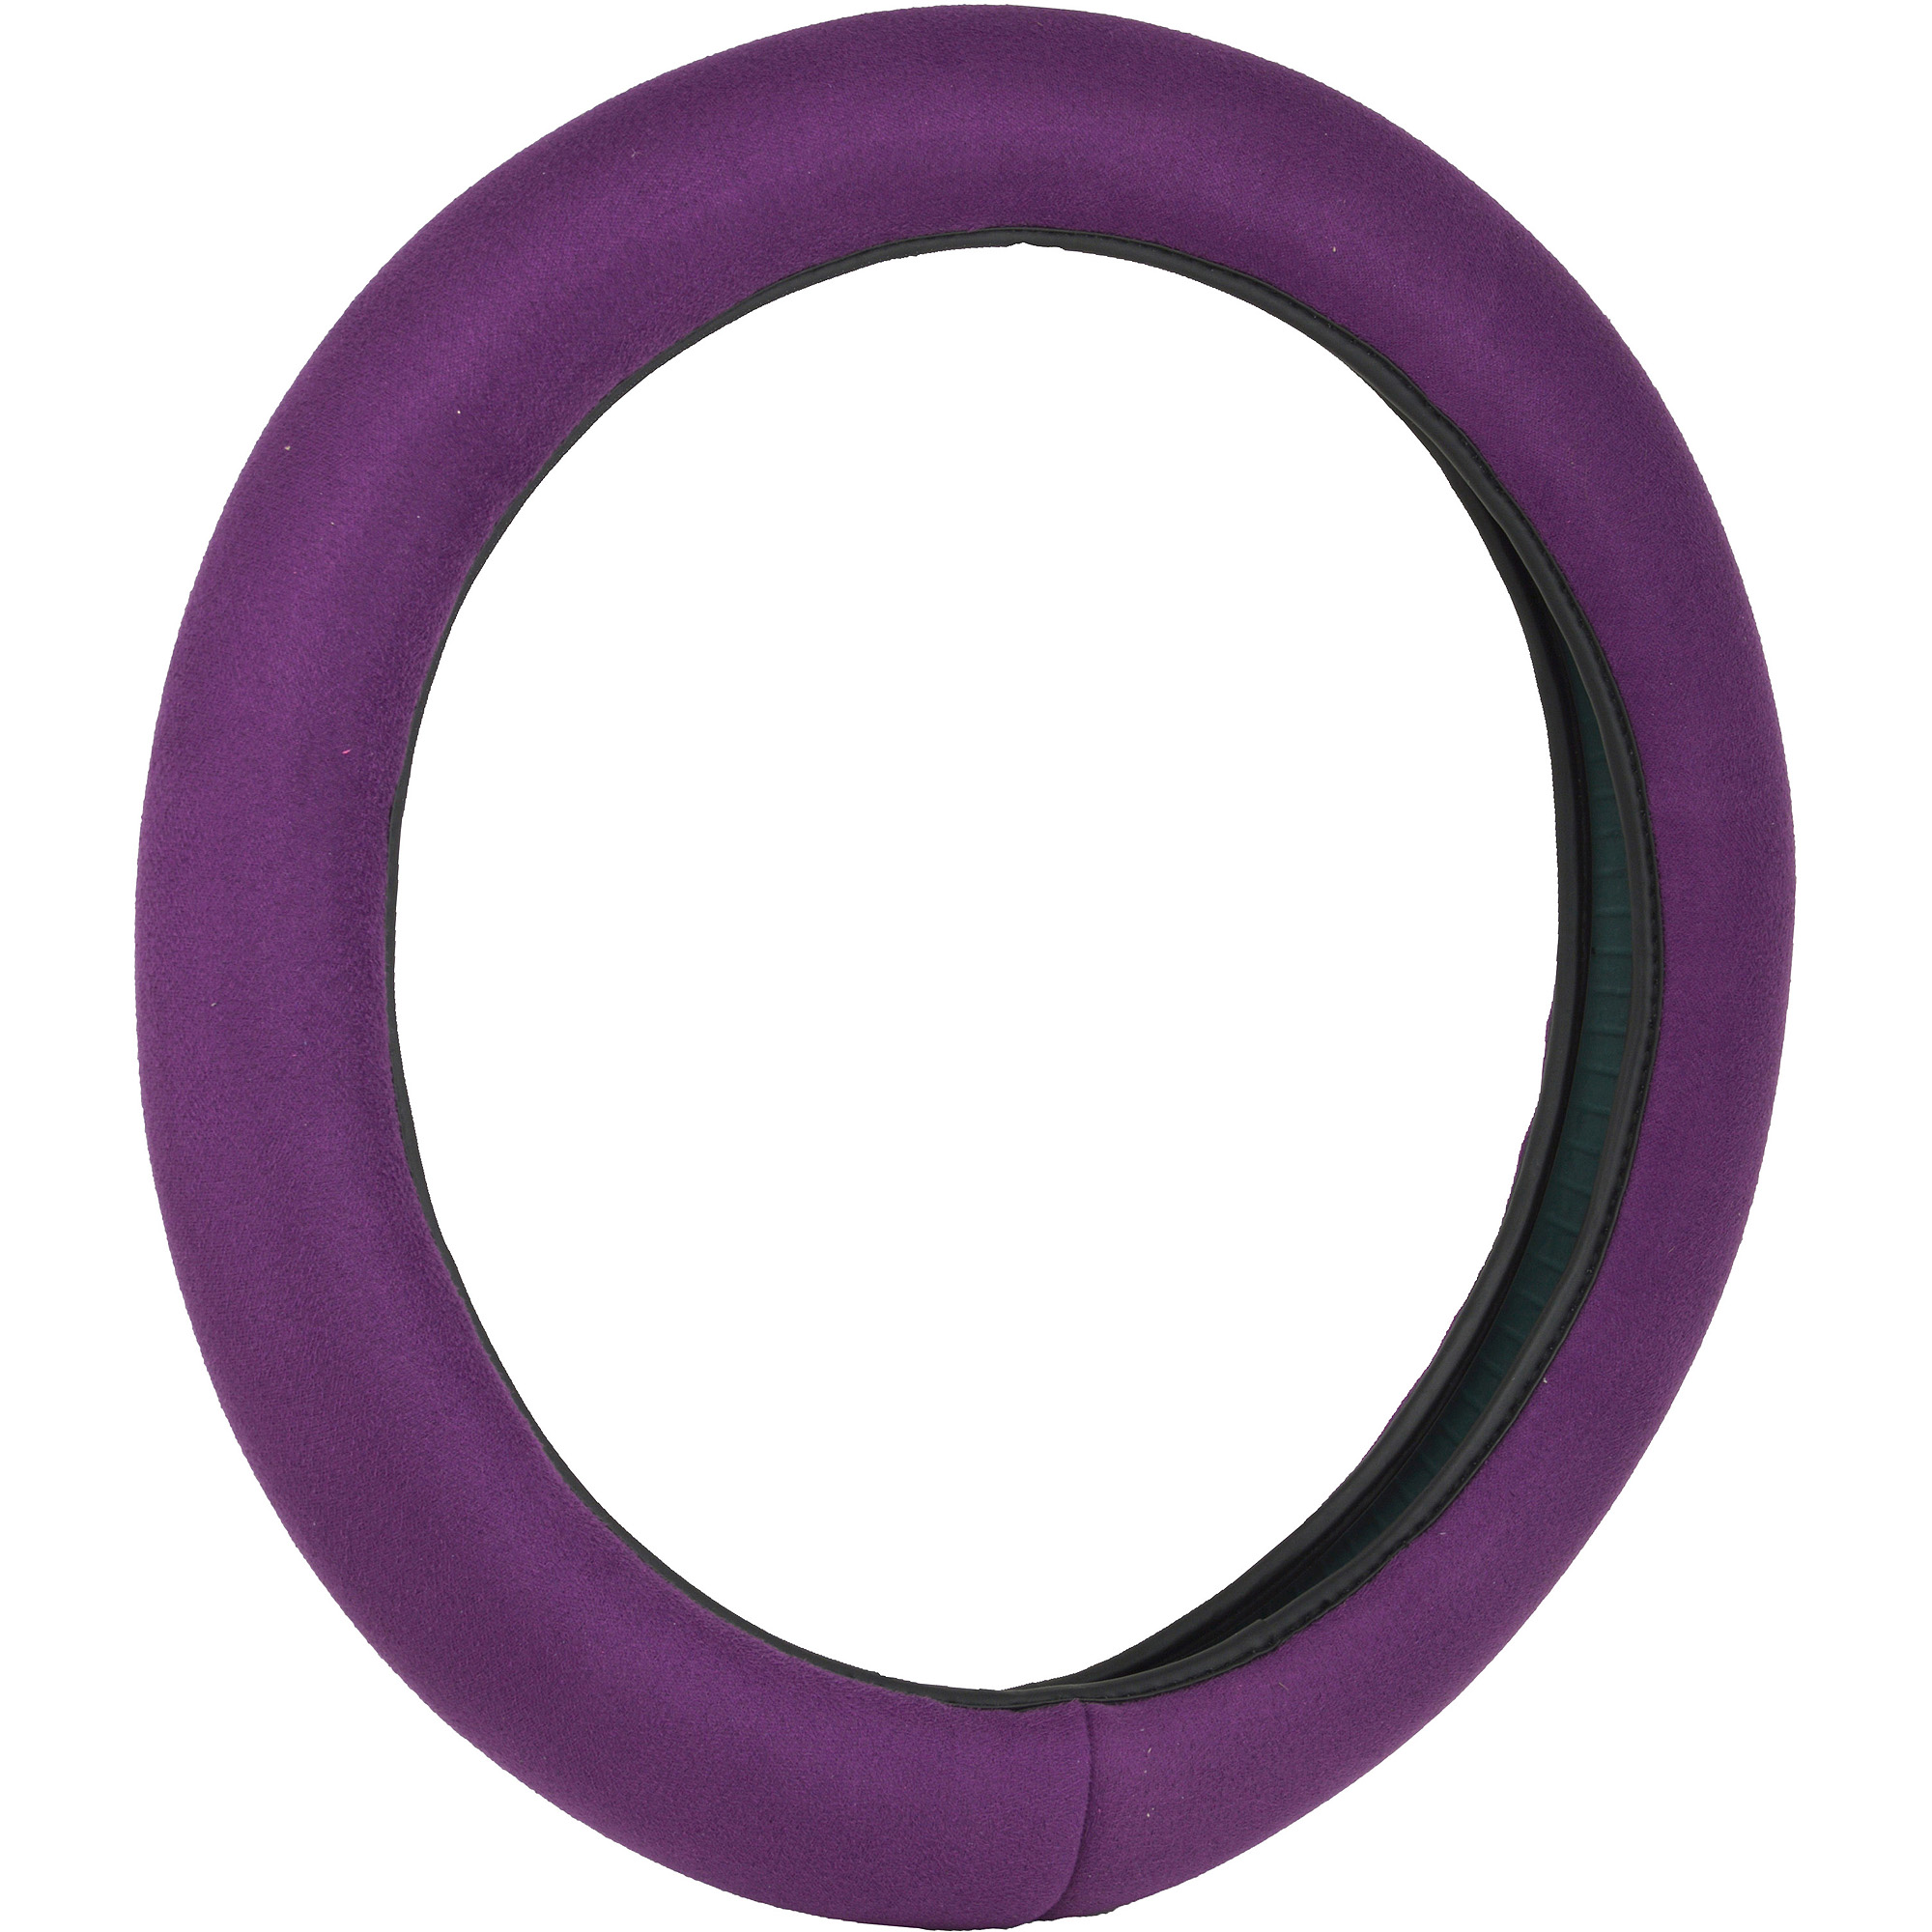 Bell Automotive Purple Stress Releiver Hyper-Flex Core Steering Wheel Cover